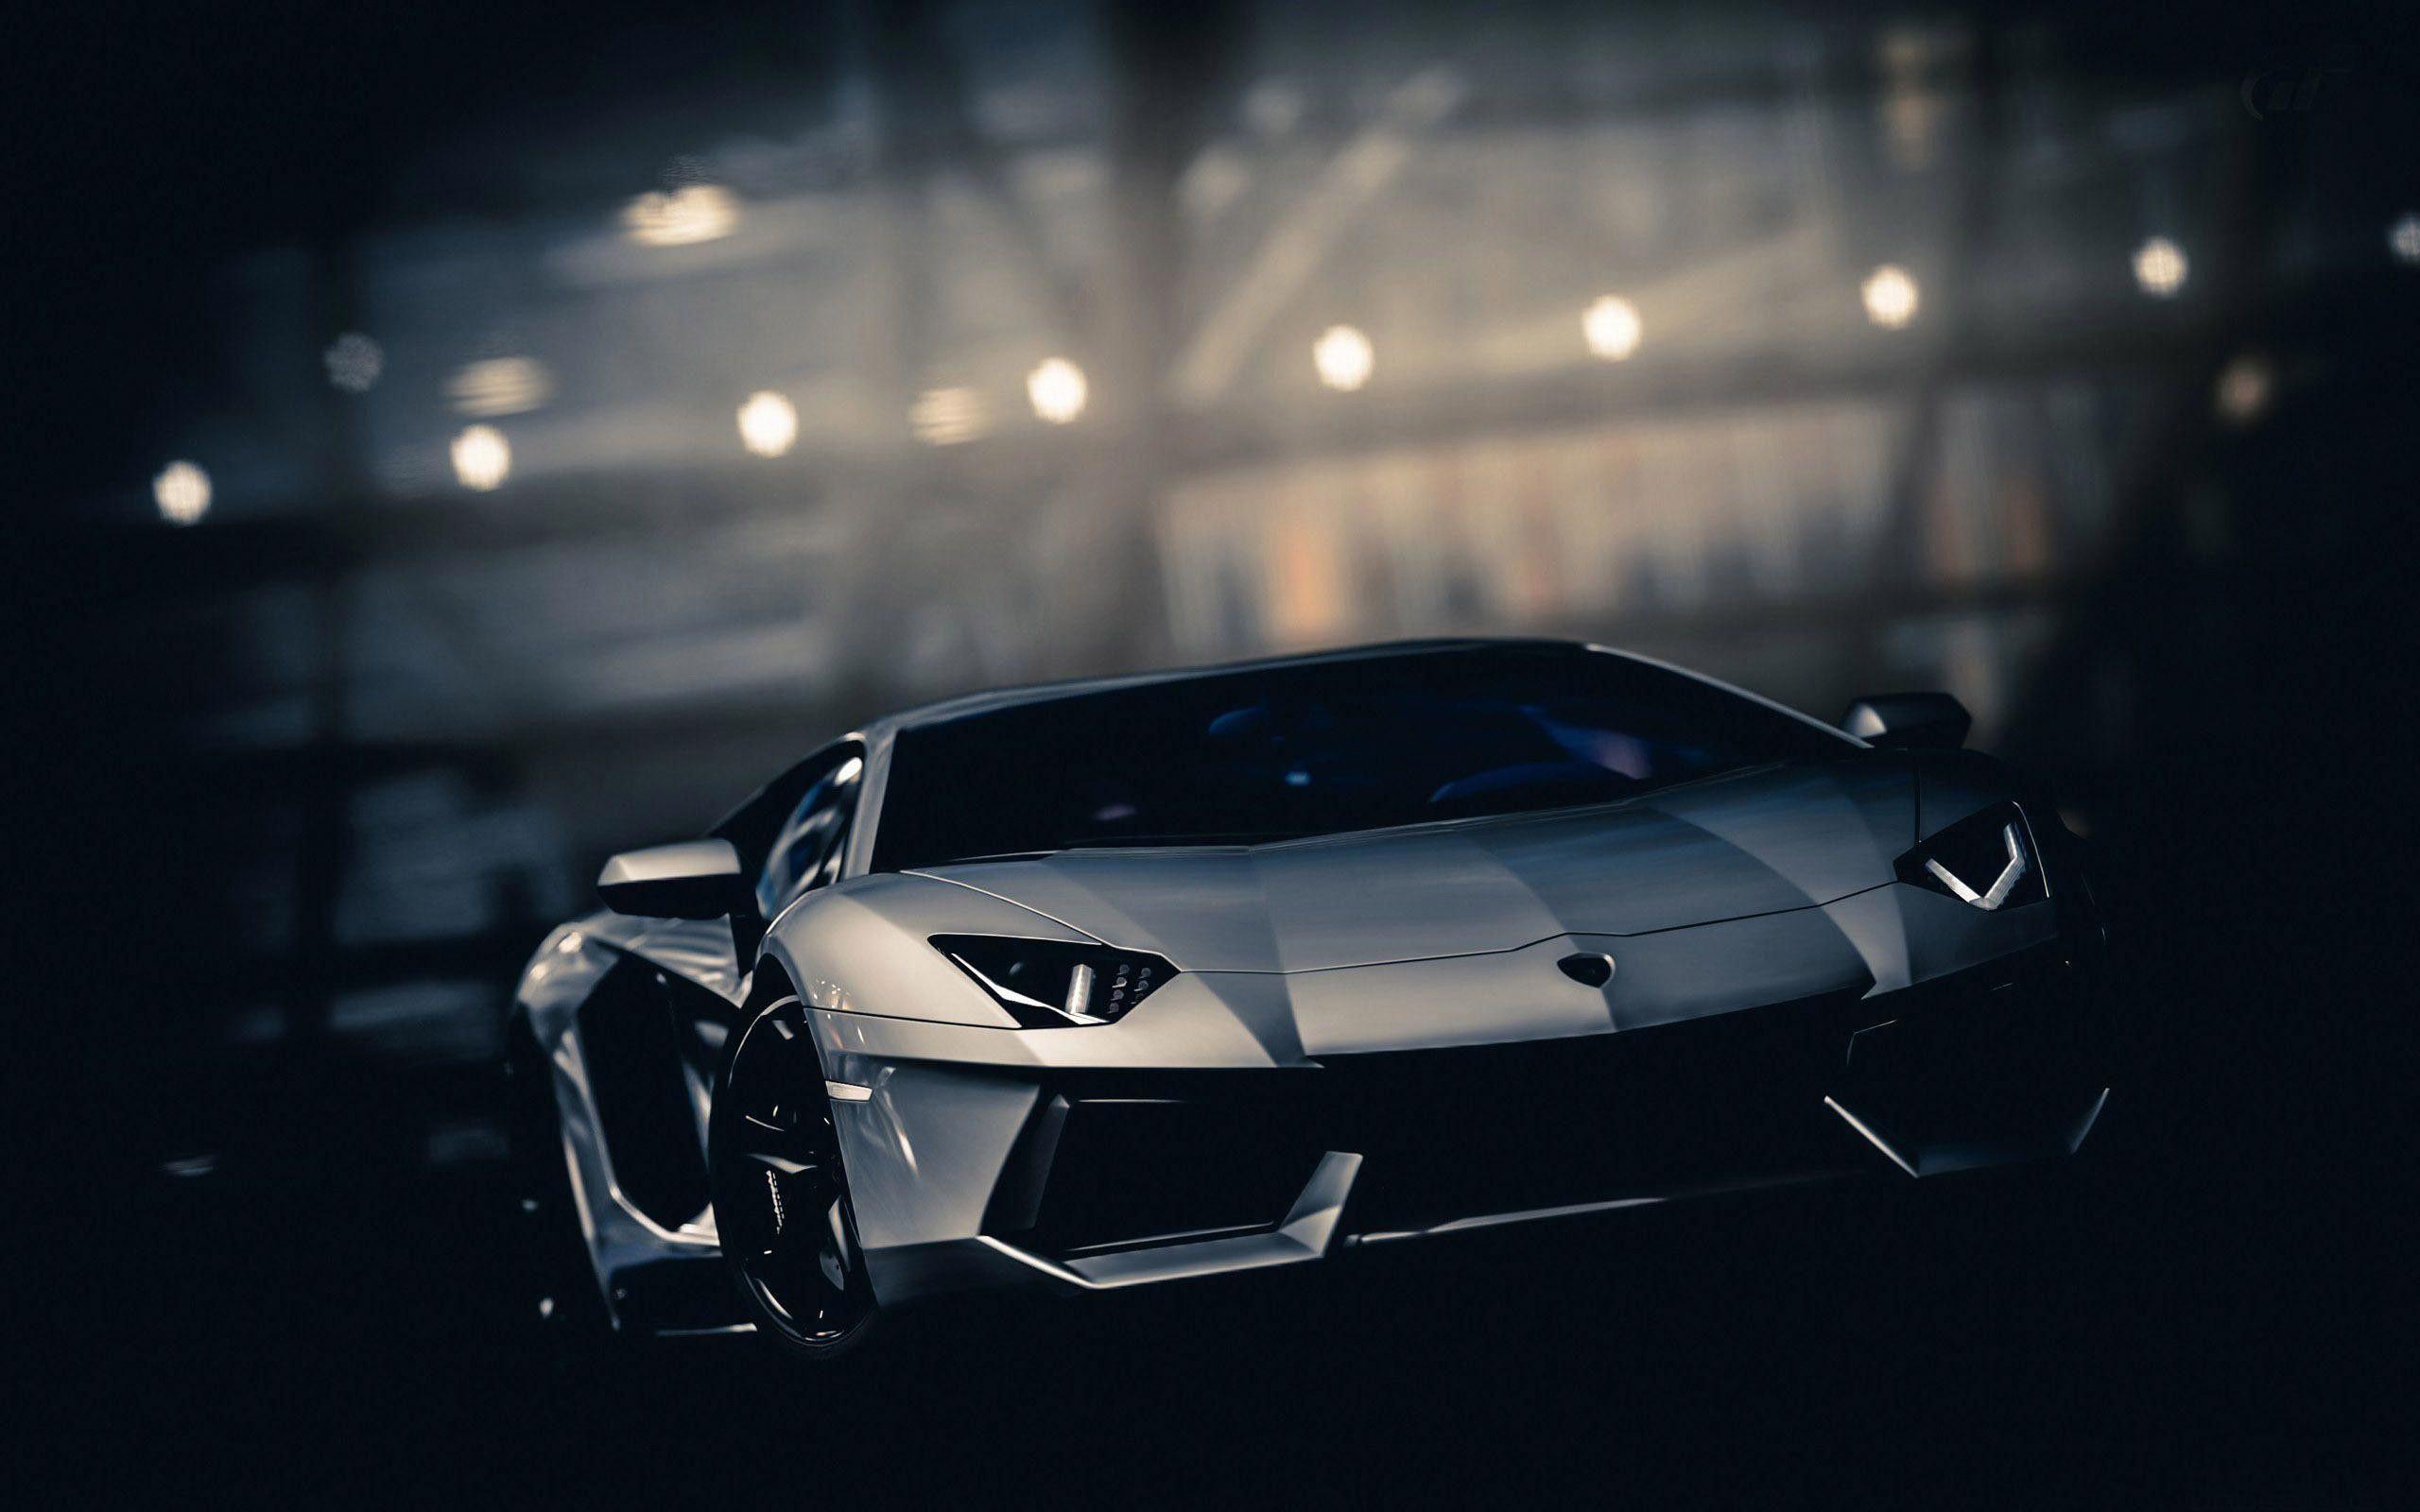 Res: 2560x1600, Lamborghini. | Wallpapers For  Lamborghini Aventador Black ... #luxurycars #lamborghiniaventador